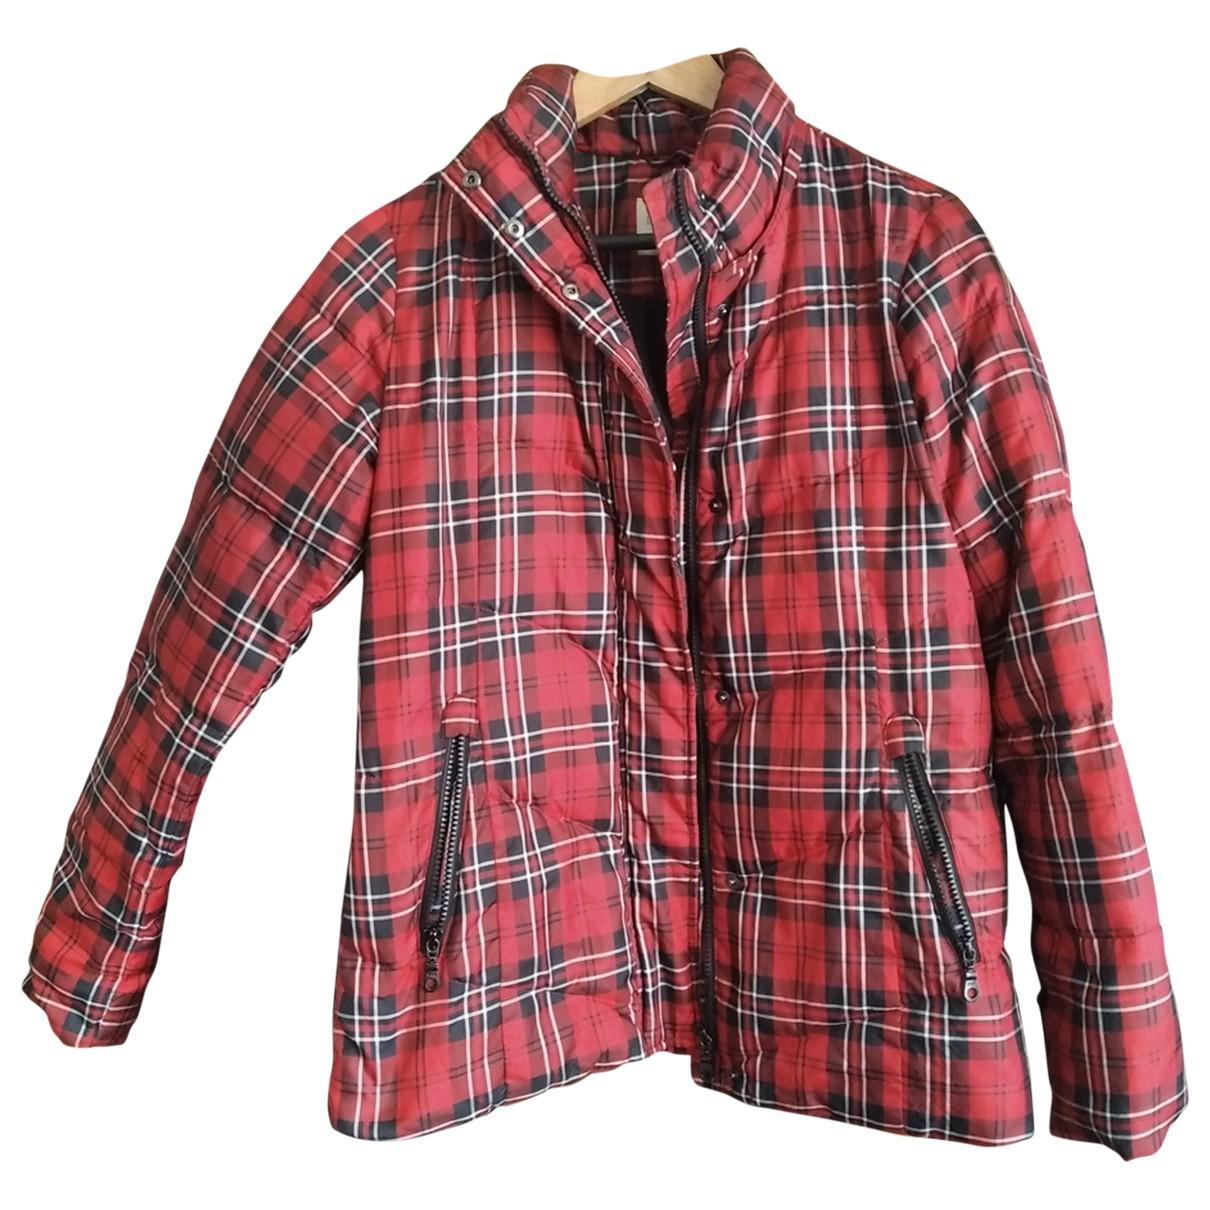 Uniqlo \N Red jacket for Women XS International